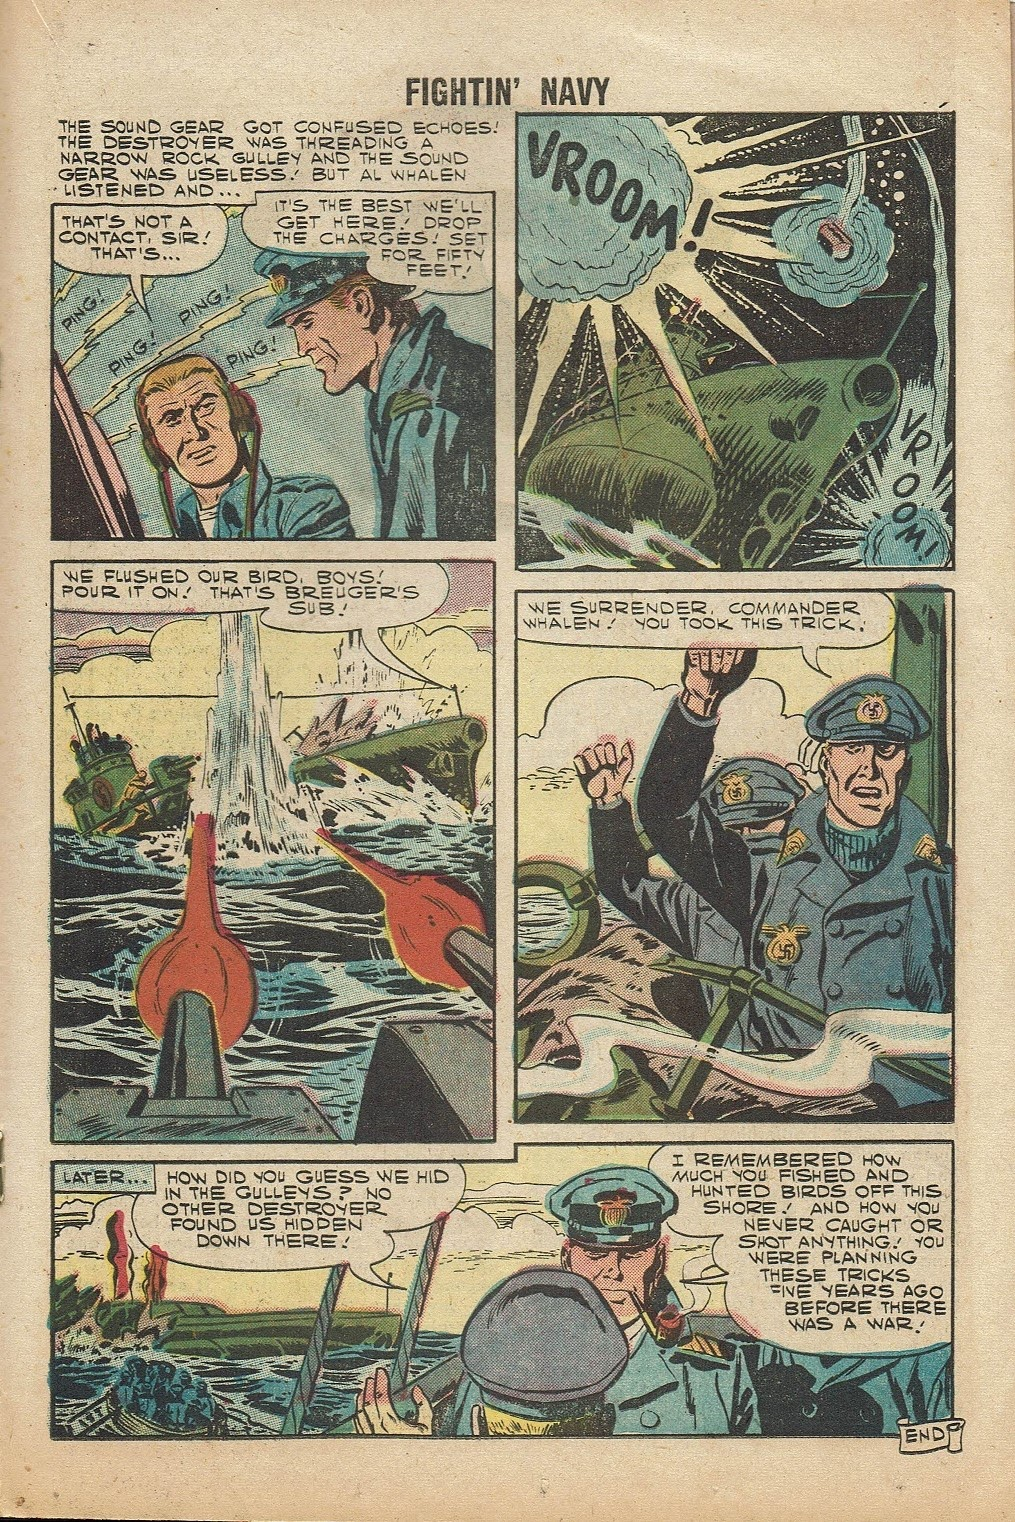 Read online Fightin' Navy comic -  Issue #81 - 19